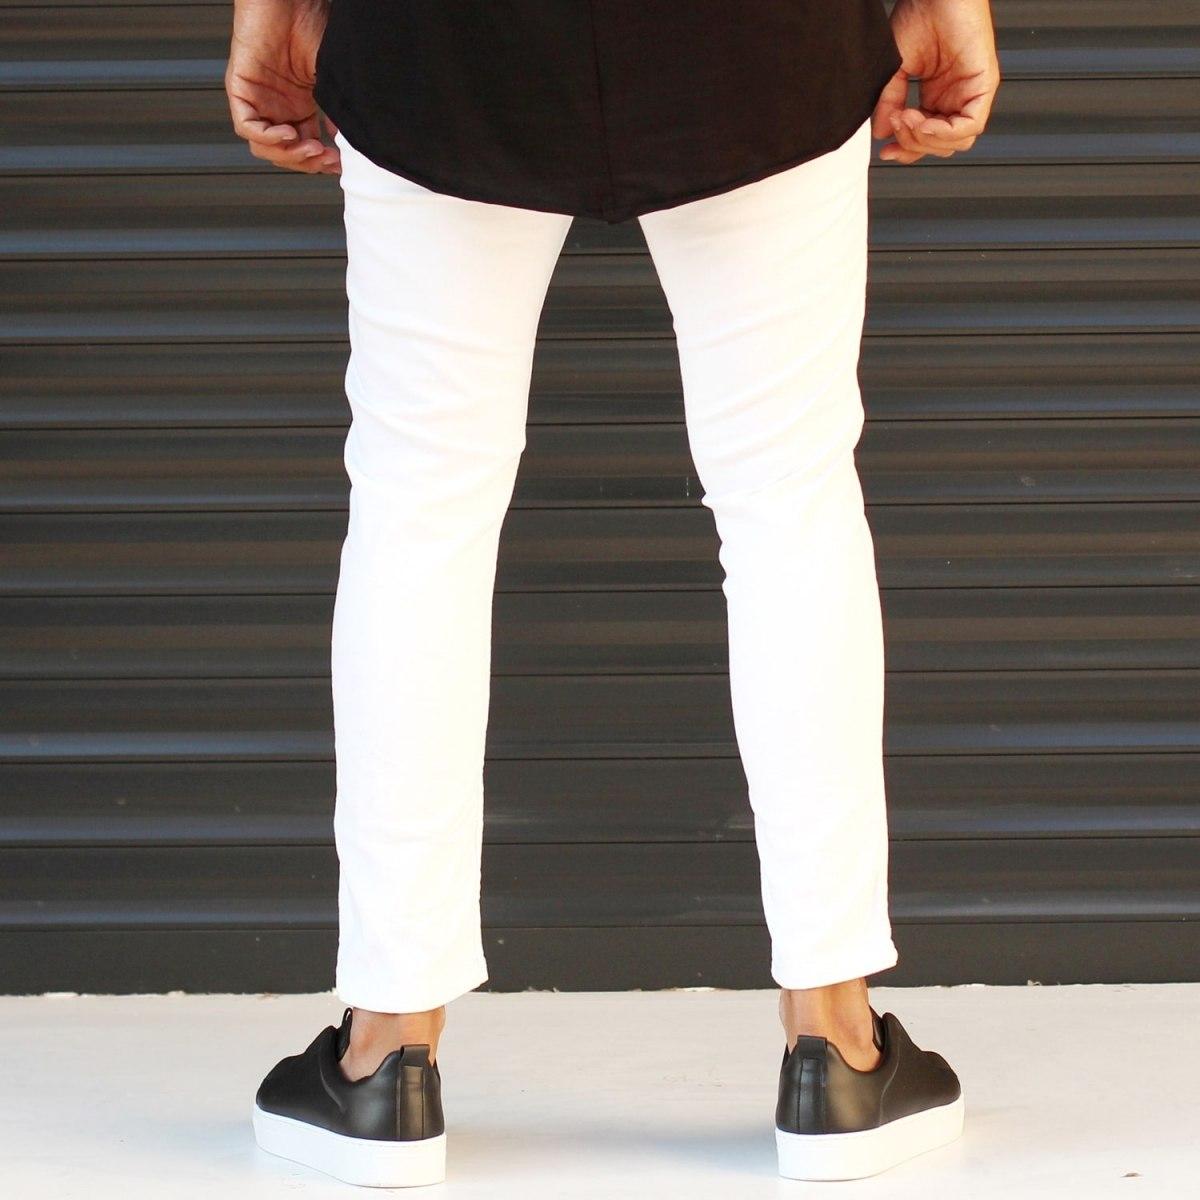 Men's Jeans With Rips In White Mv Premium Brand - 4